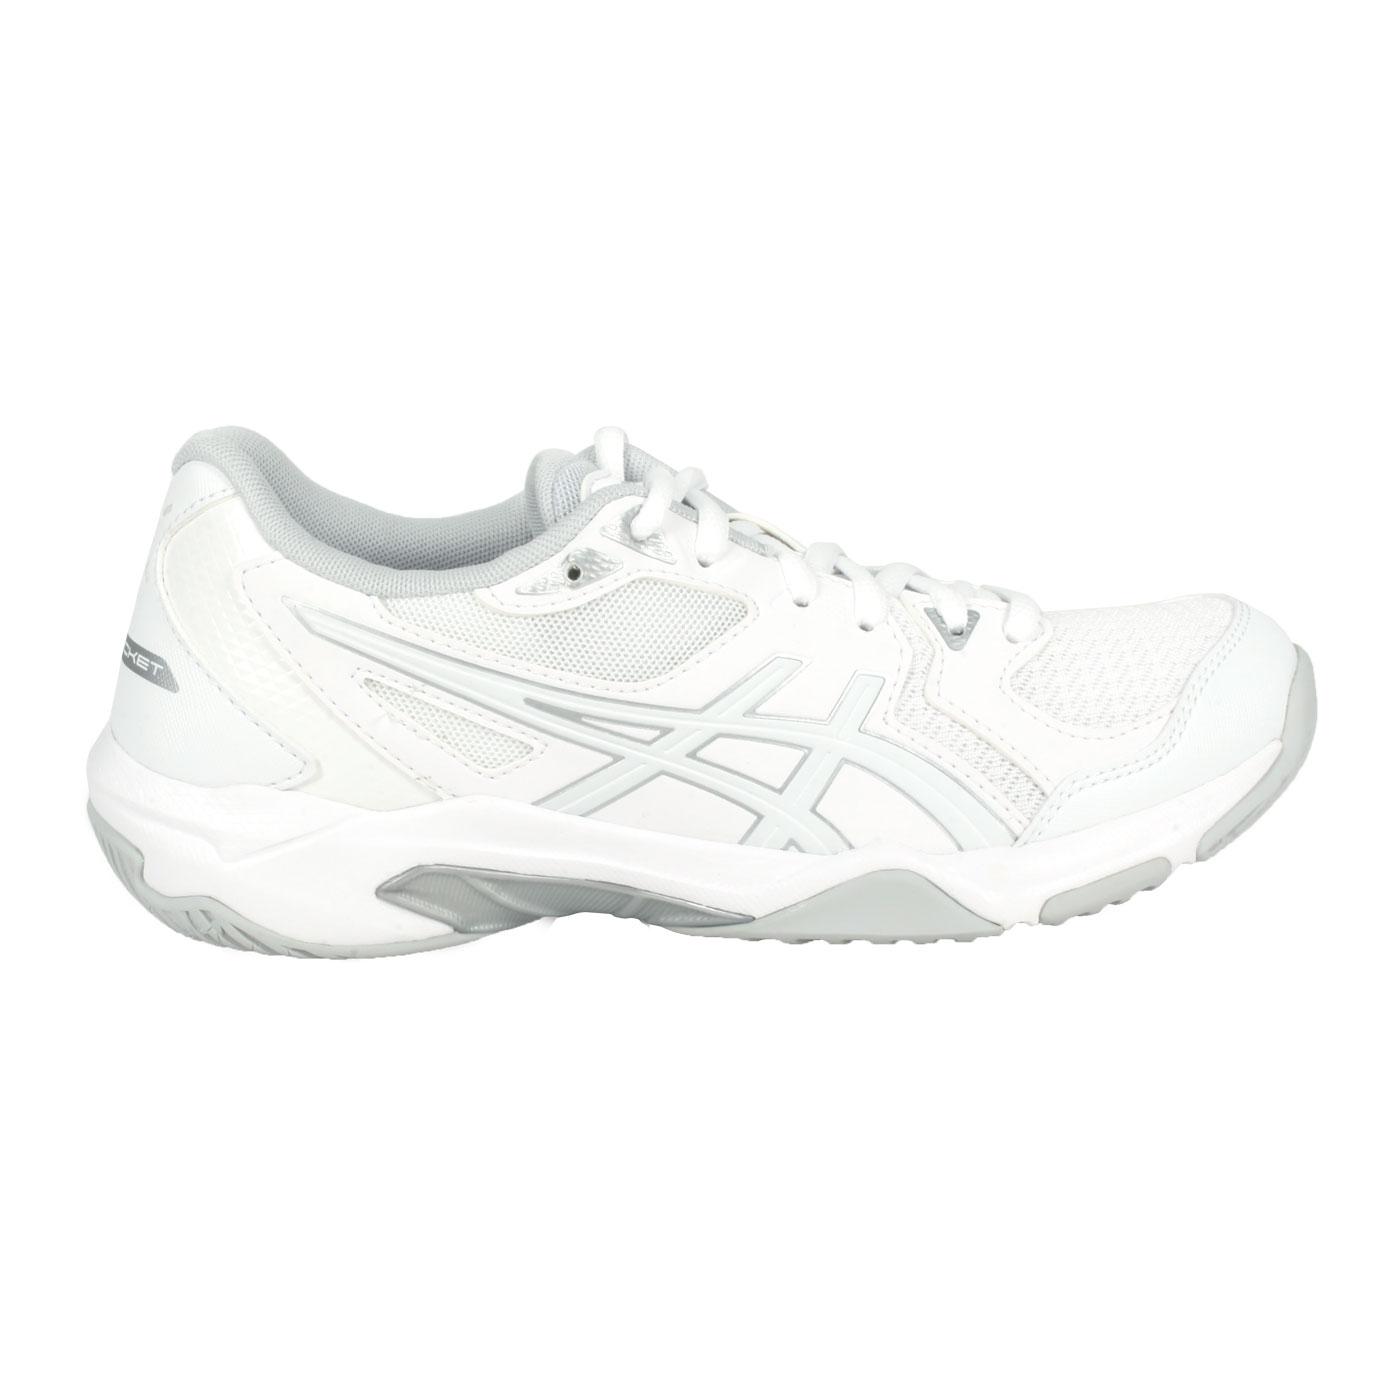 ASICS 女款排羽球鞋  @GEL-ROCKET 10@1072A056-106